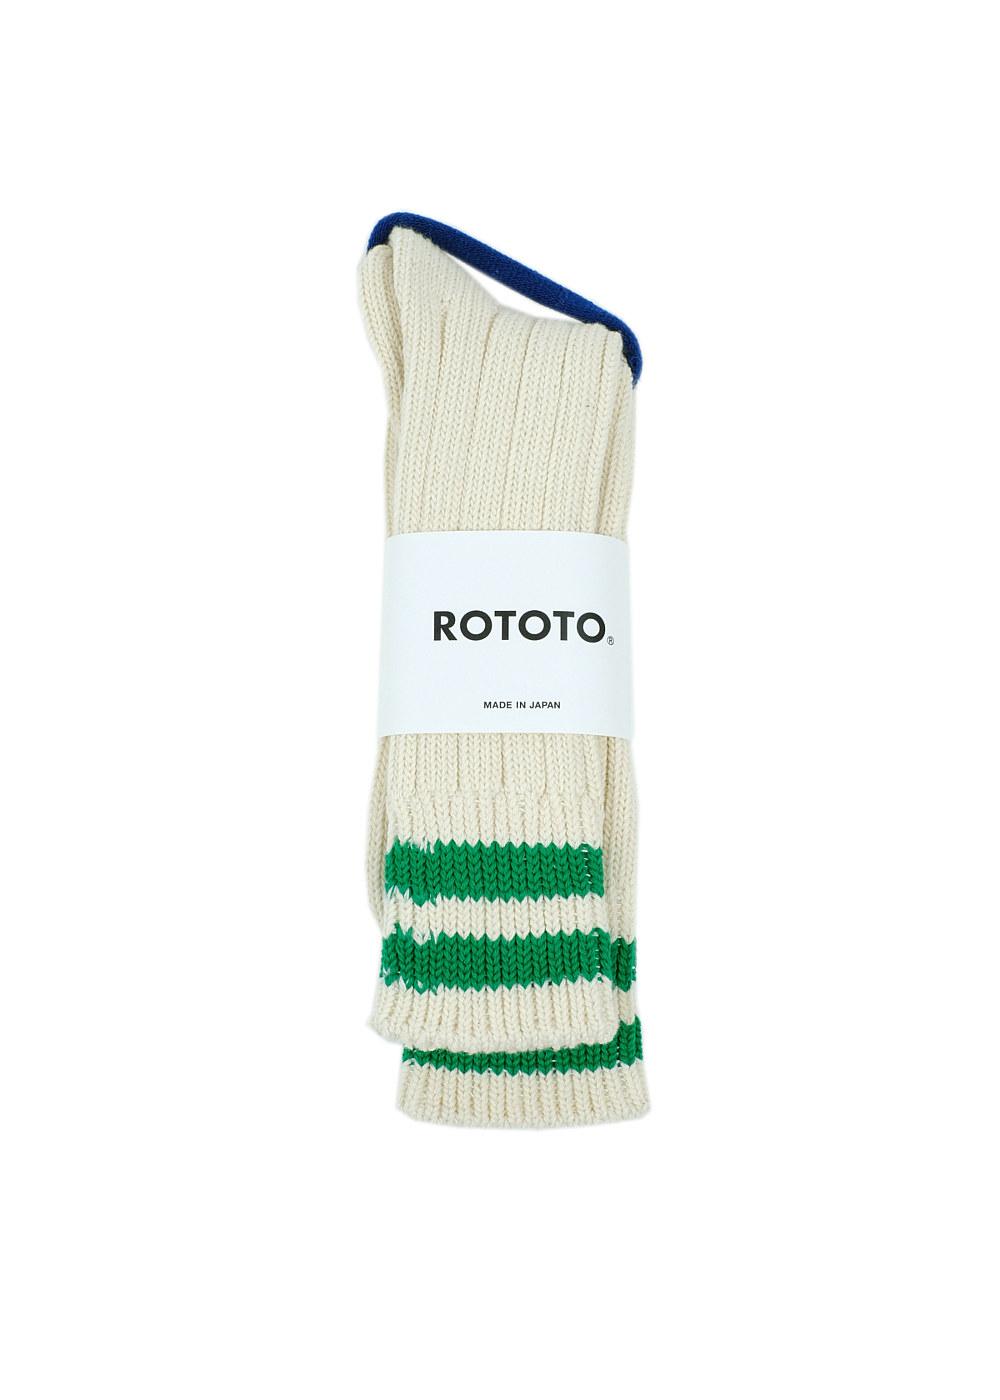 Rototo-LowRawSocks-2-Stripes-Ecru-M.Green-01.jpg